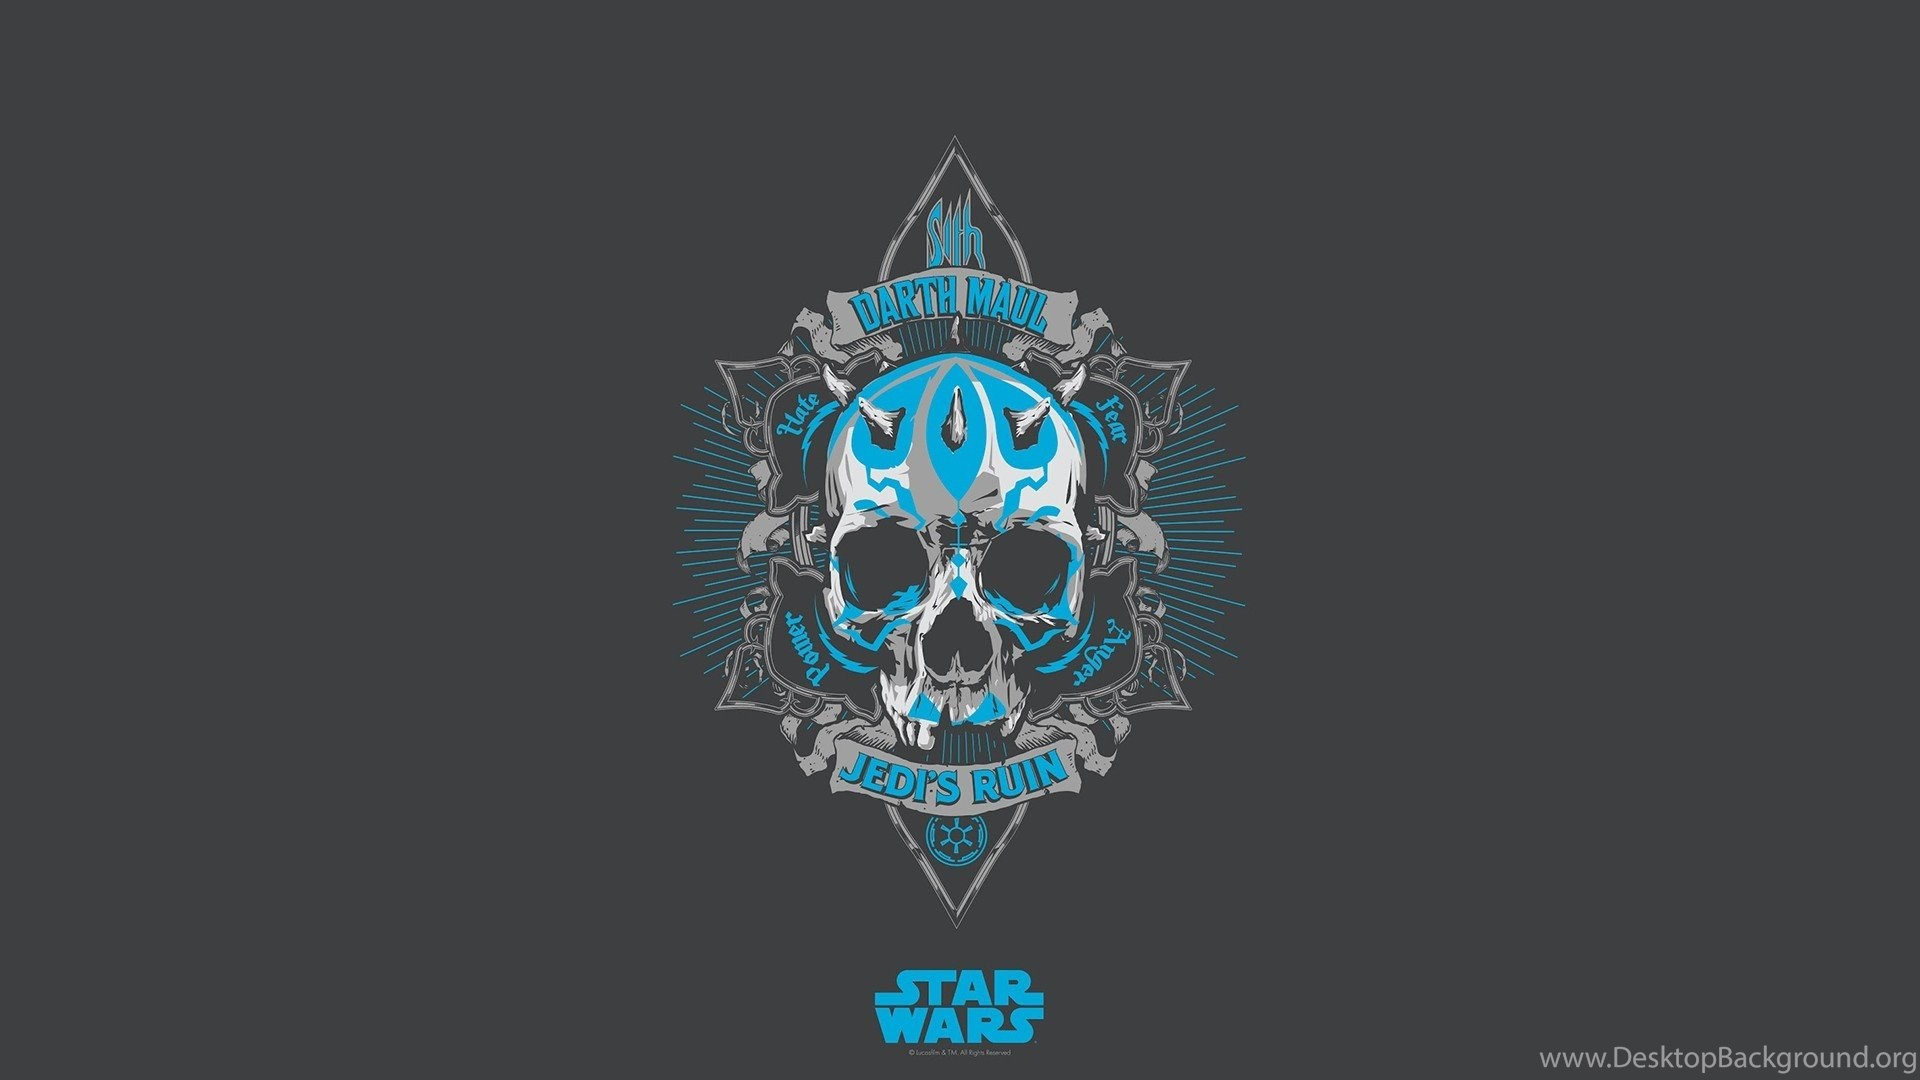 736588 star wars logo darth maul jedi sith wallpapers hd